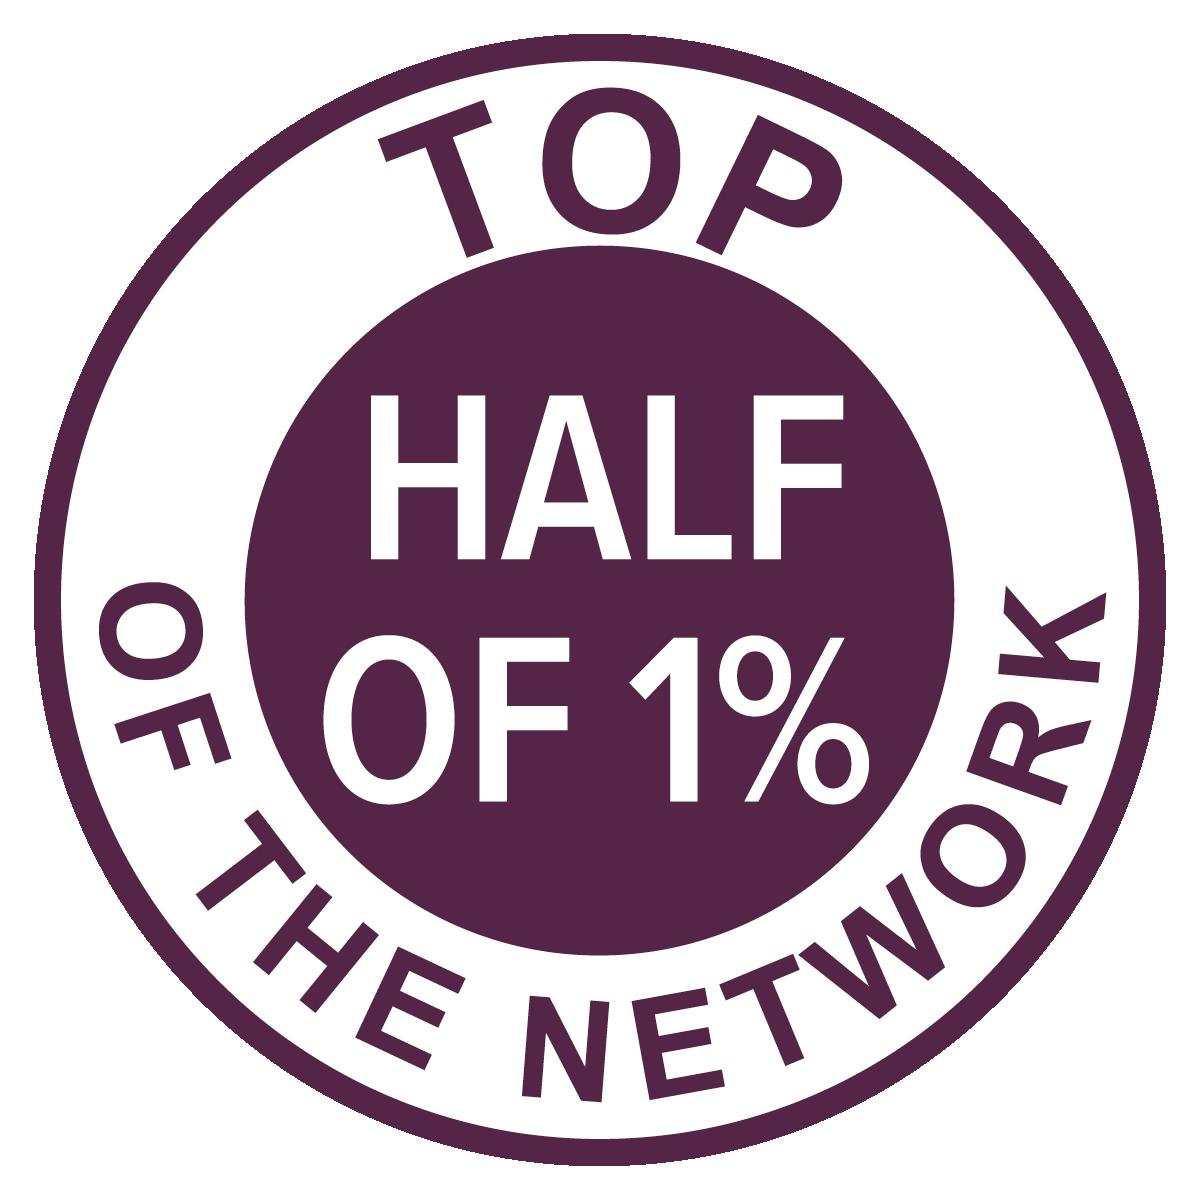 Top 1/2 of 1%